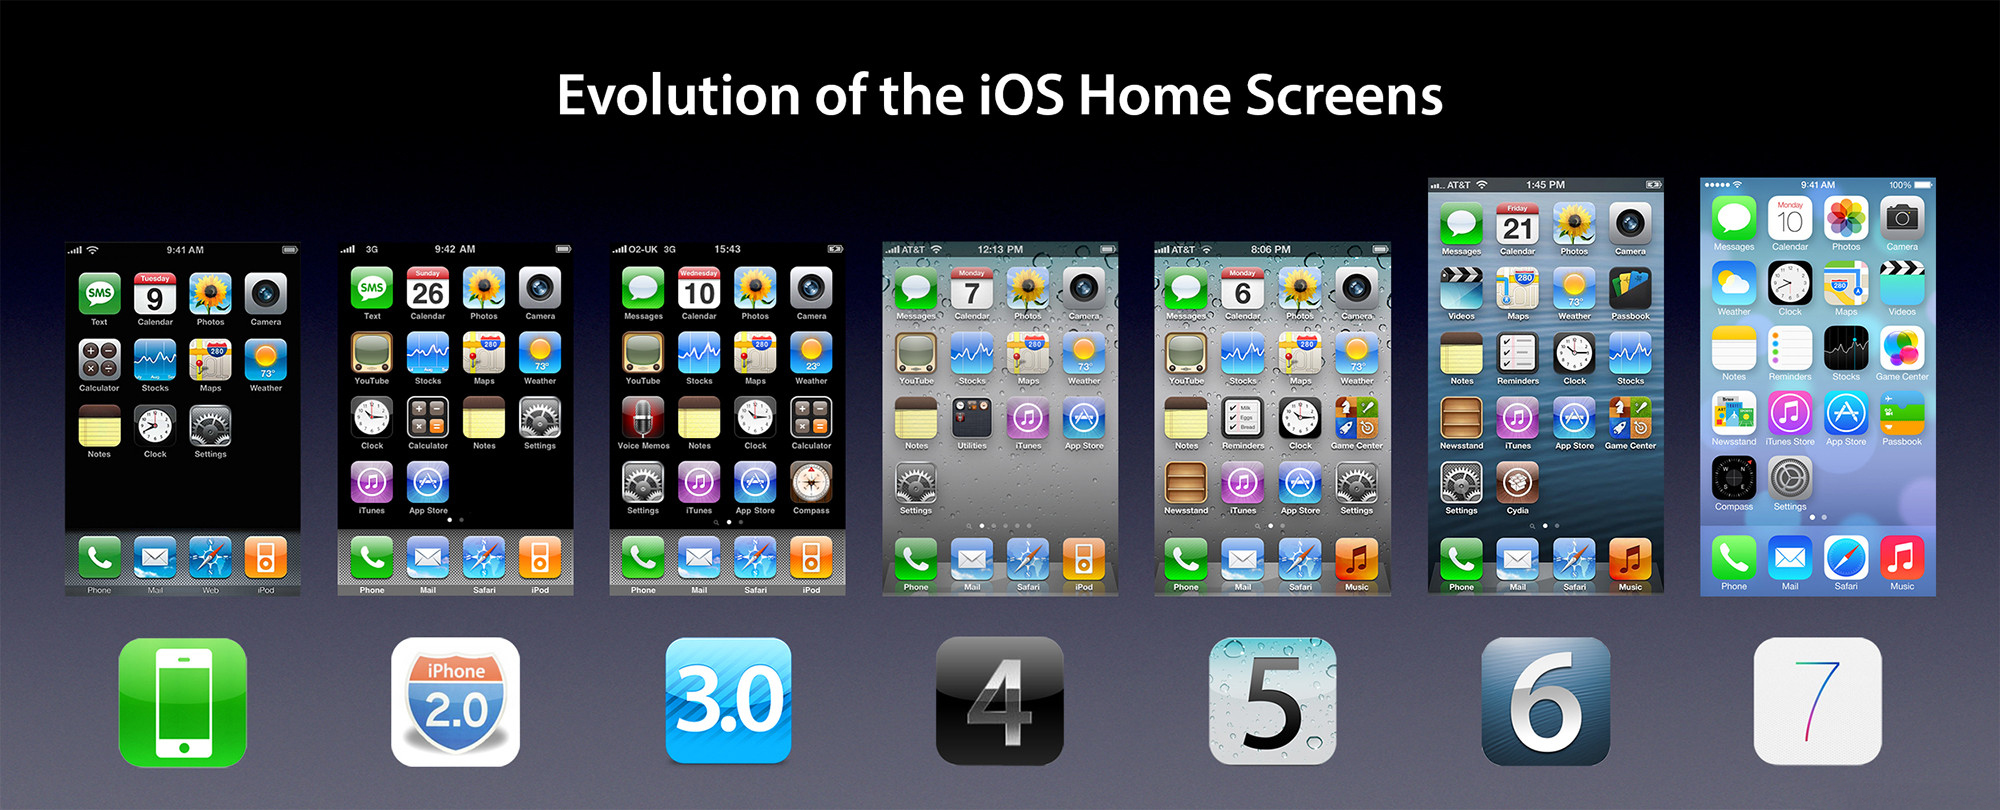 iOS evolution - SvetApple.sk